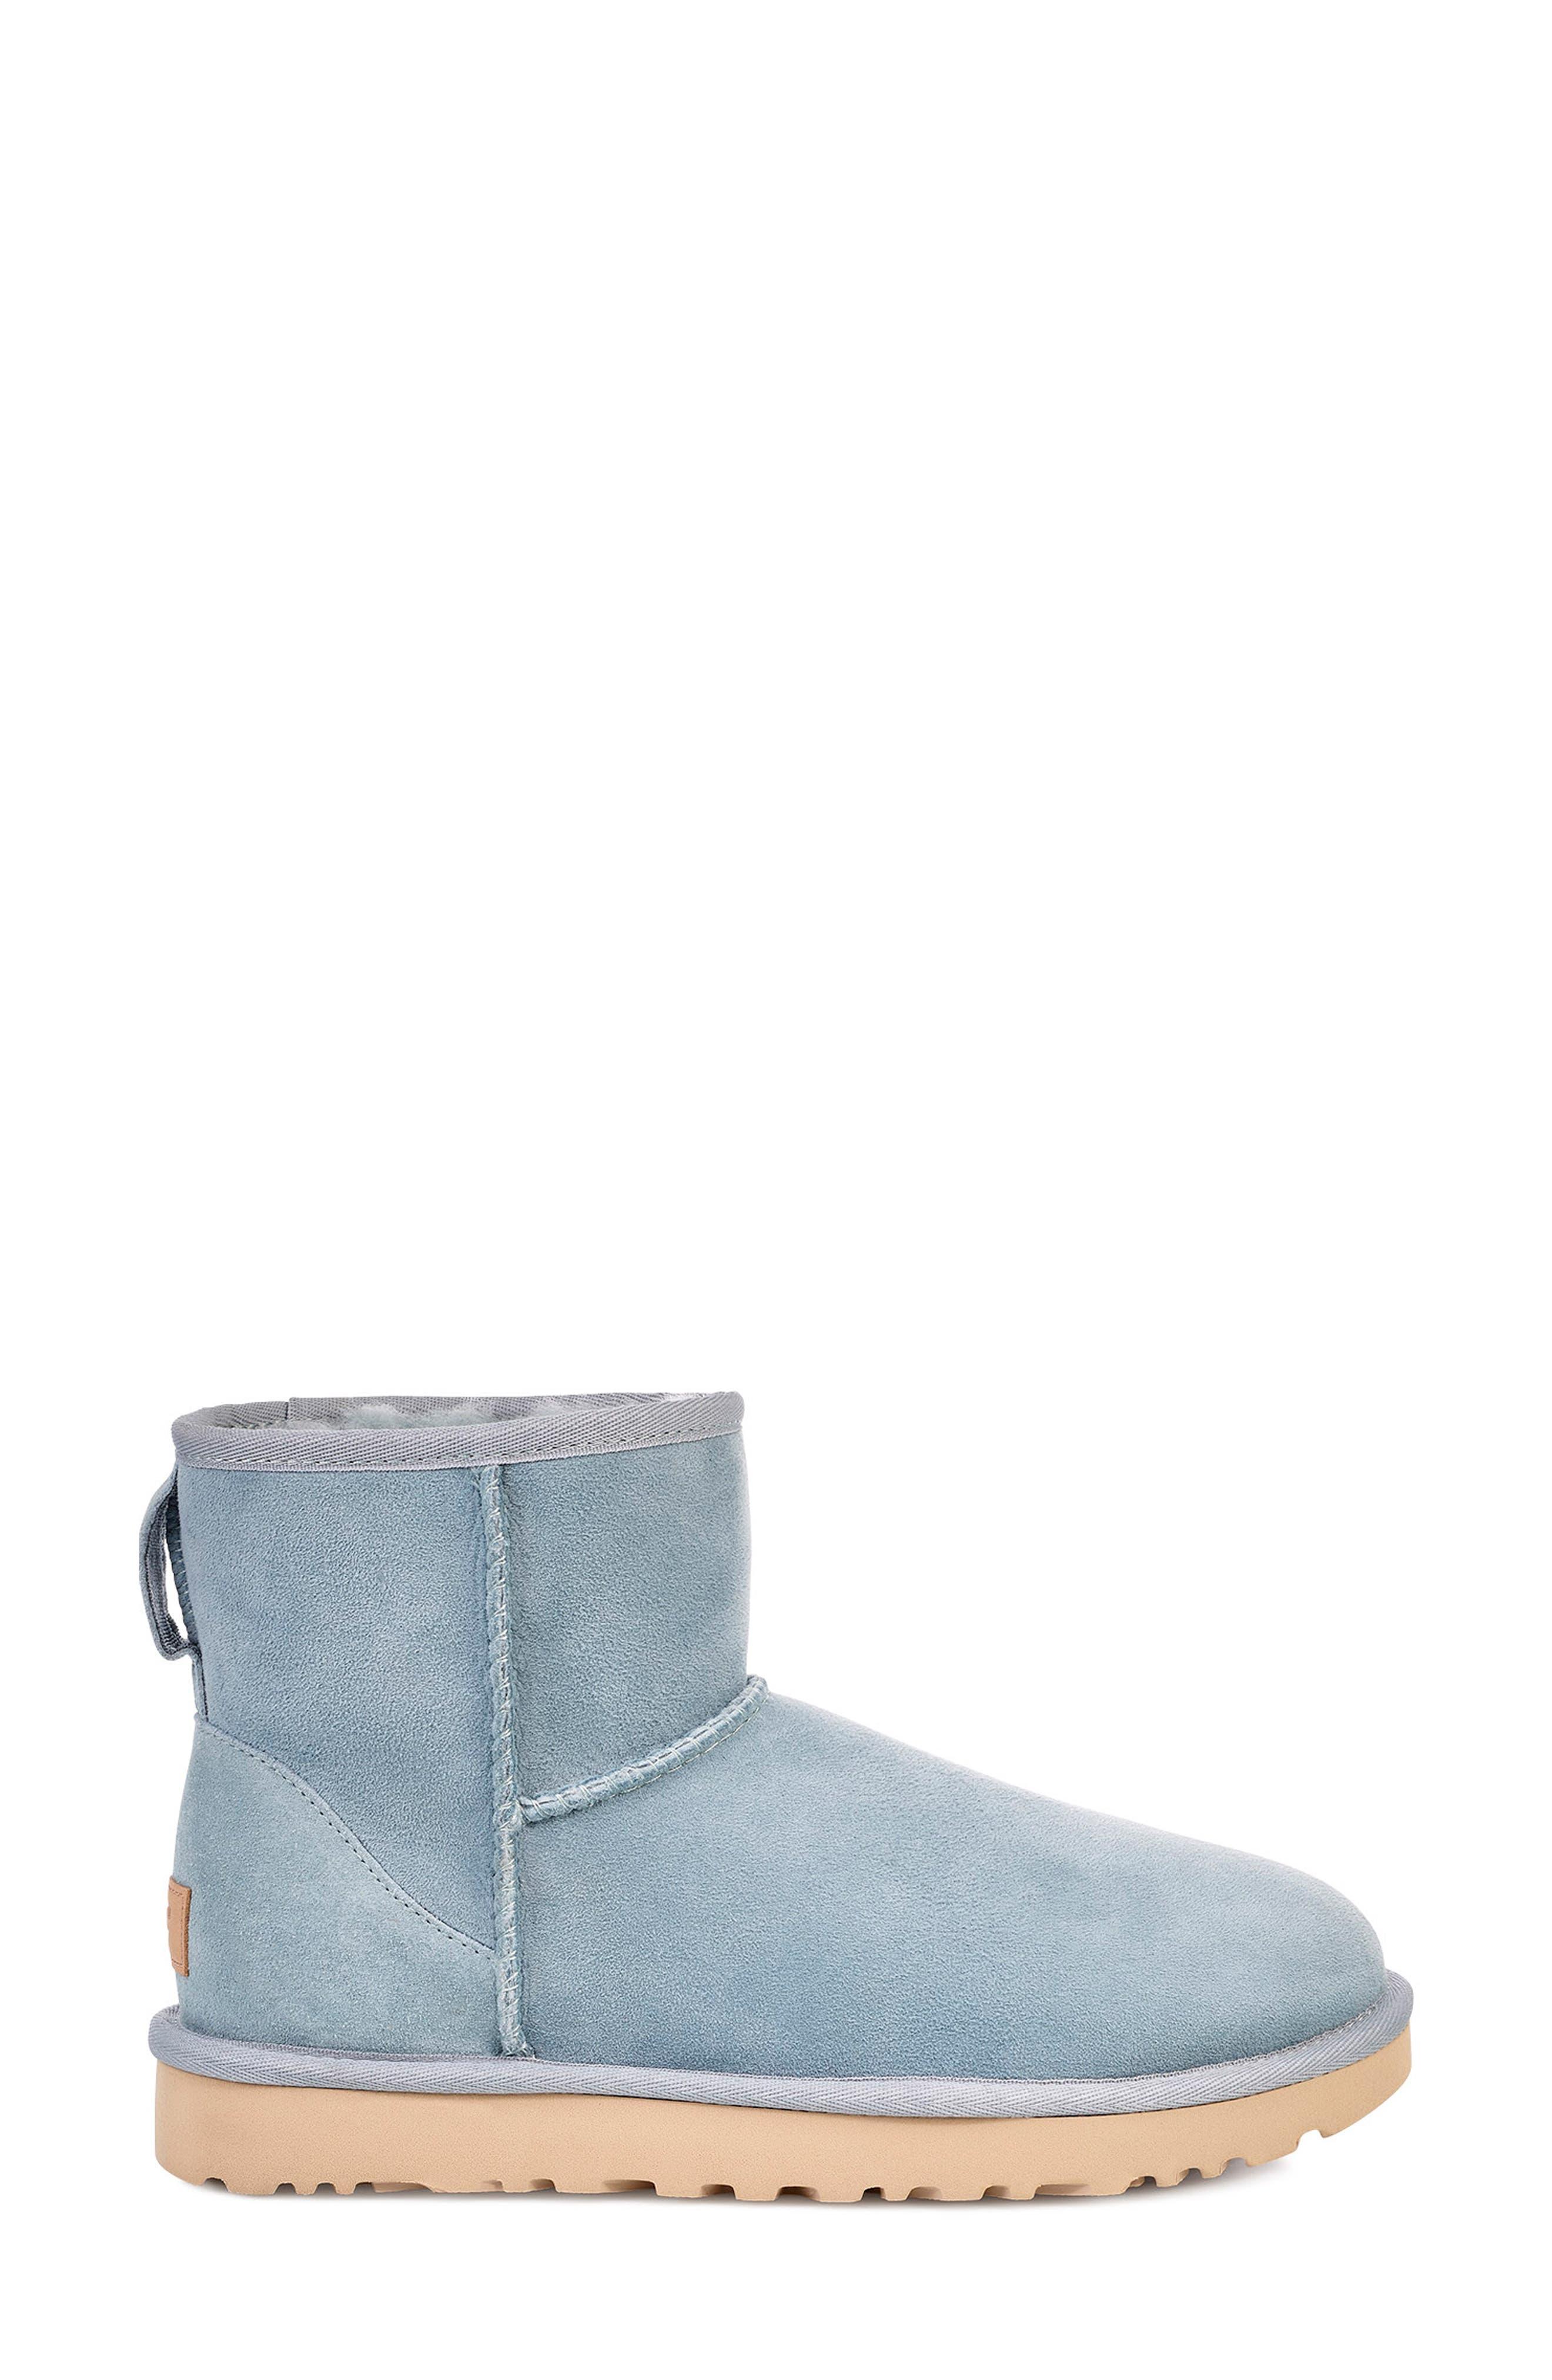 ,                             Classic Mini II Genuine Shearling Lined Boot,                             Alternate thumbnail 41, color,                             402